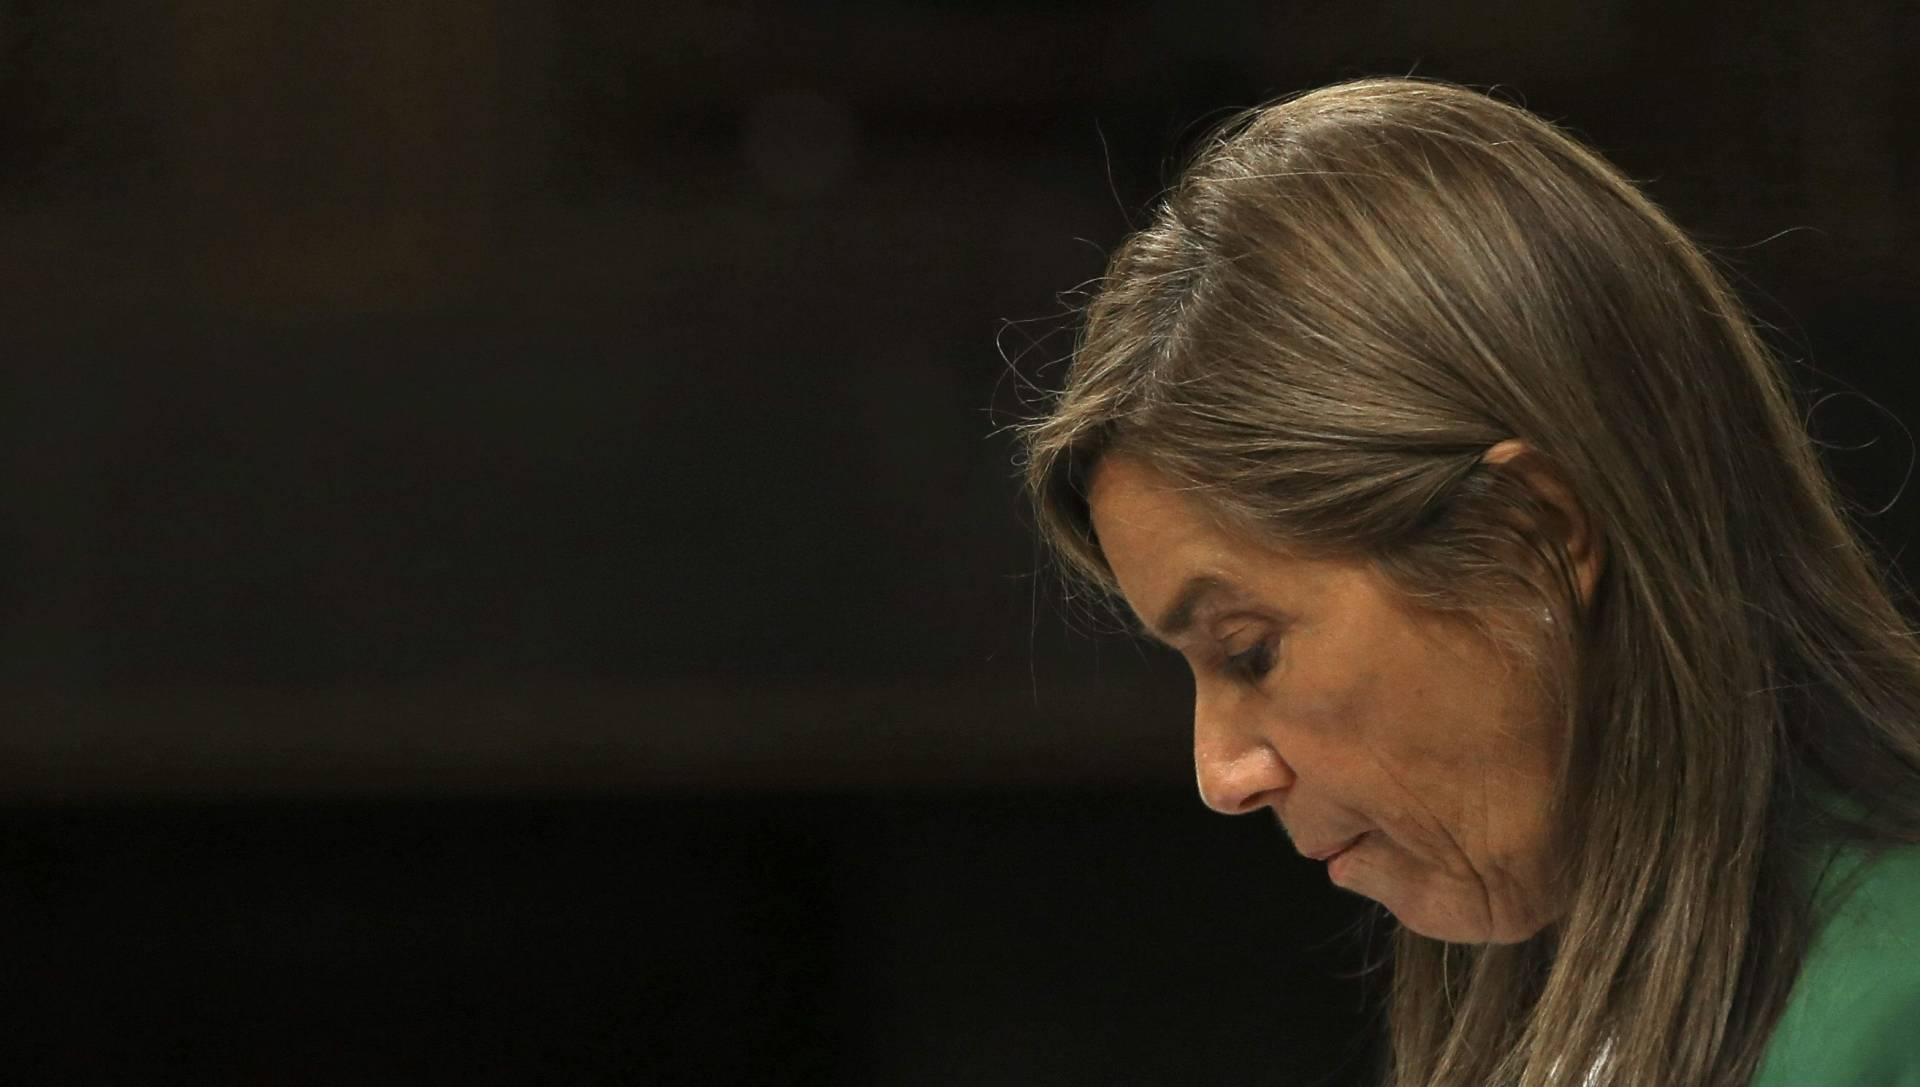 La ex ministra de Sanidad, Ana Mato, con gesto serio.